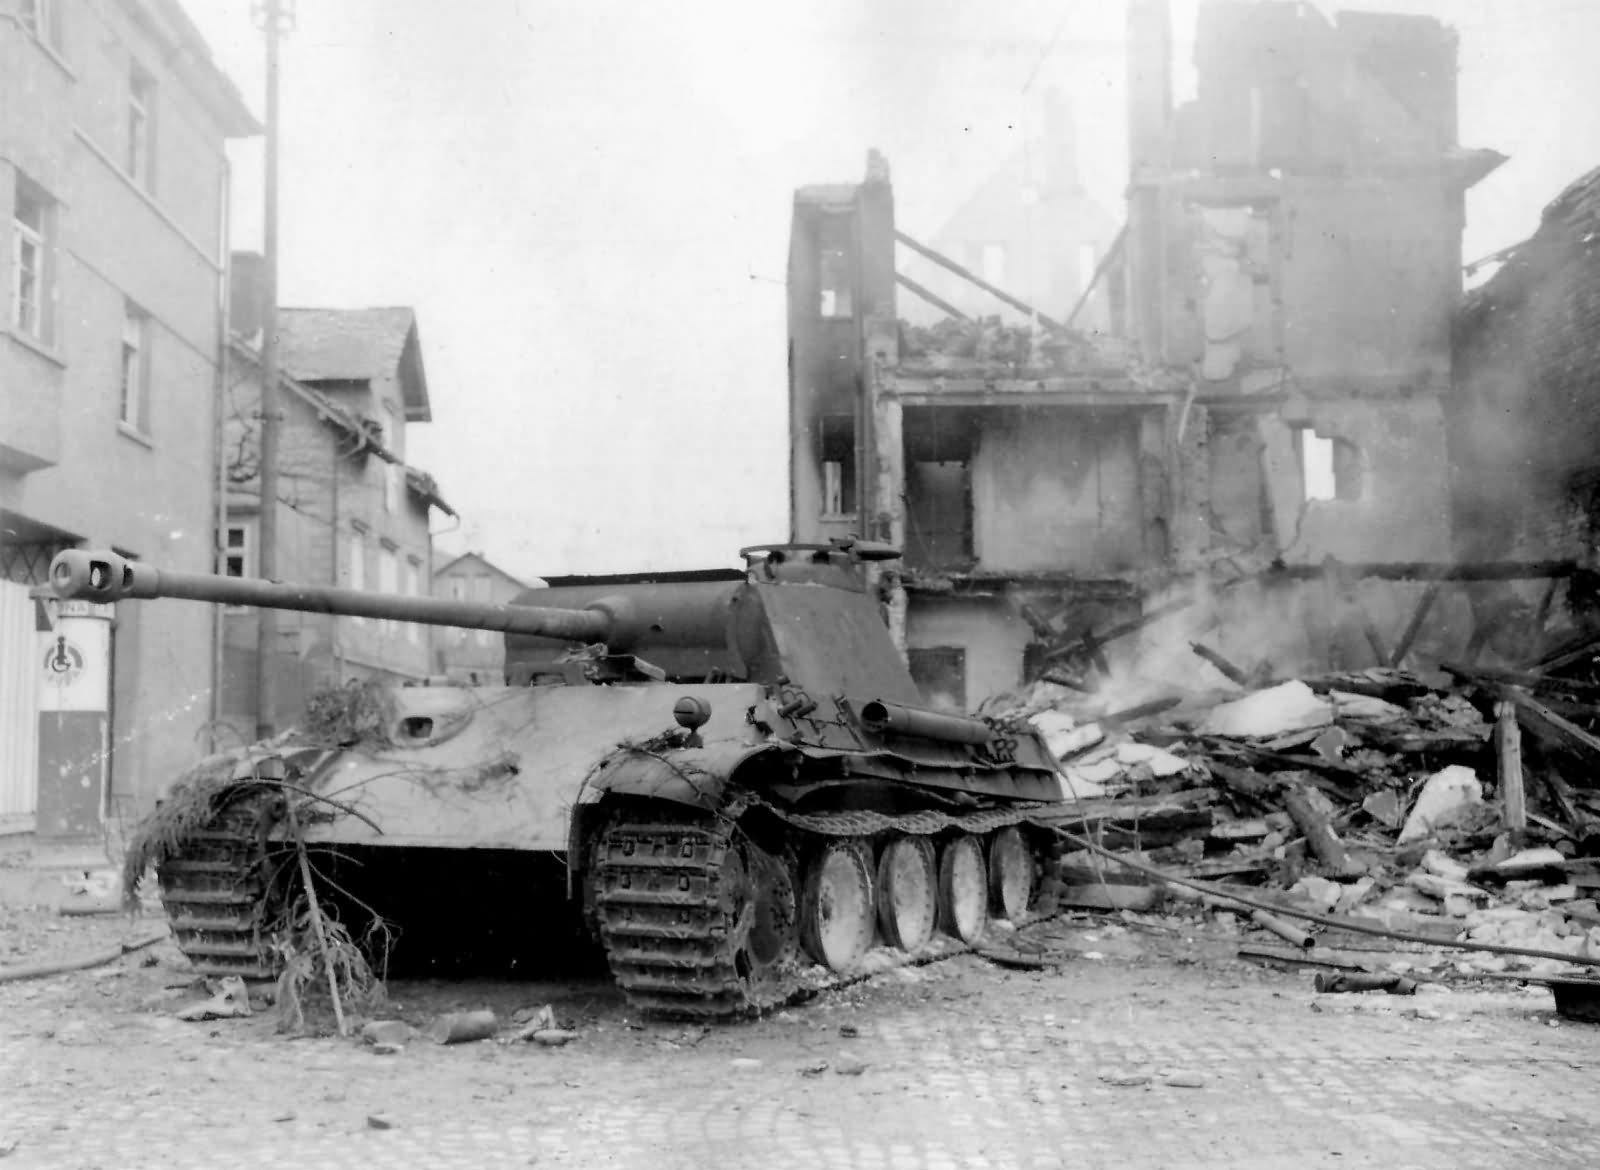 destroyed panther ausf g tank germany 1945 world war photos. Black Bedroom Furniture Sets. Home Design Ideas